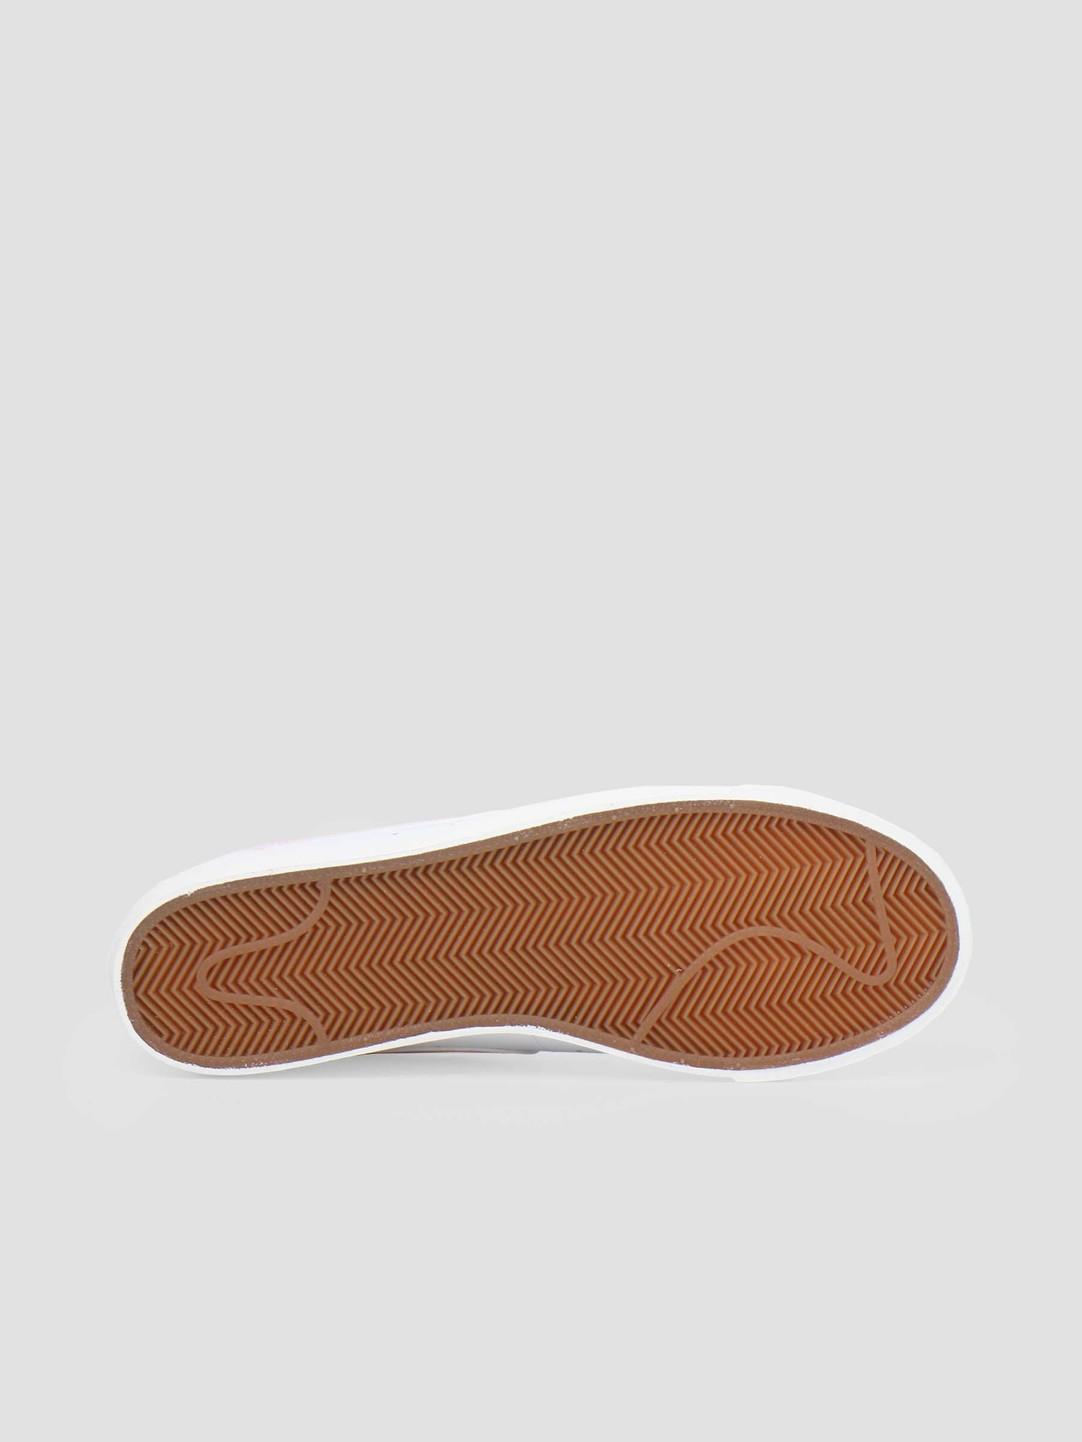 Nike Nike Blazer Low Leather White Pink Foam Sail CI6377-106